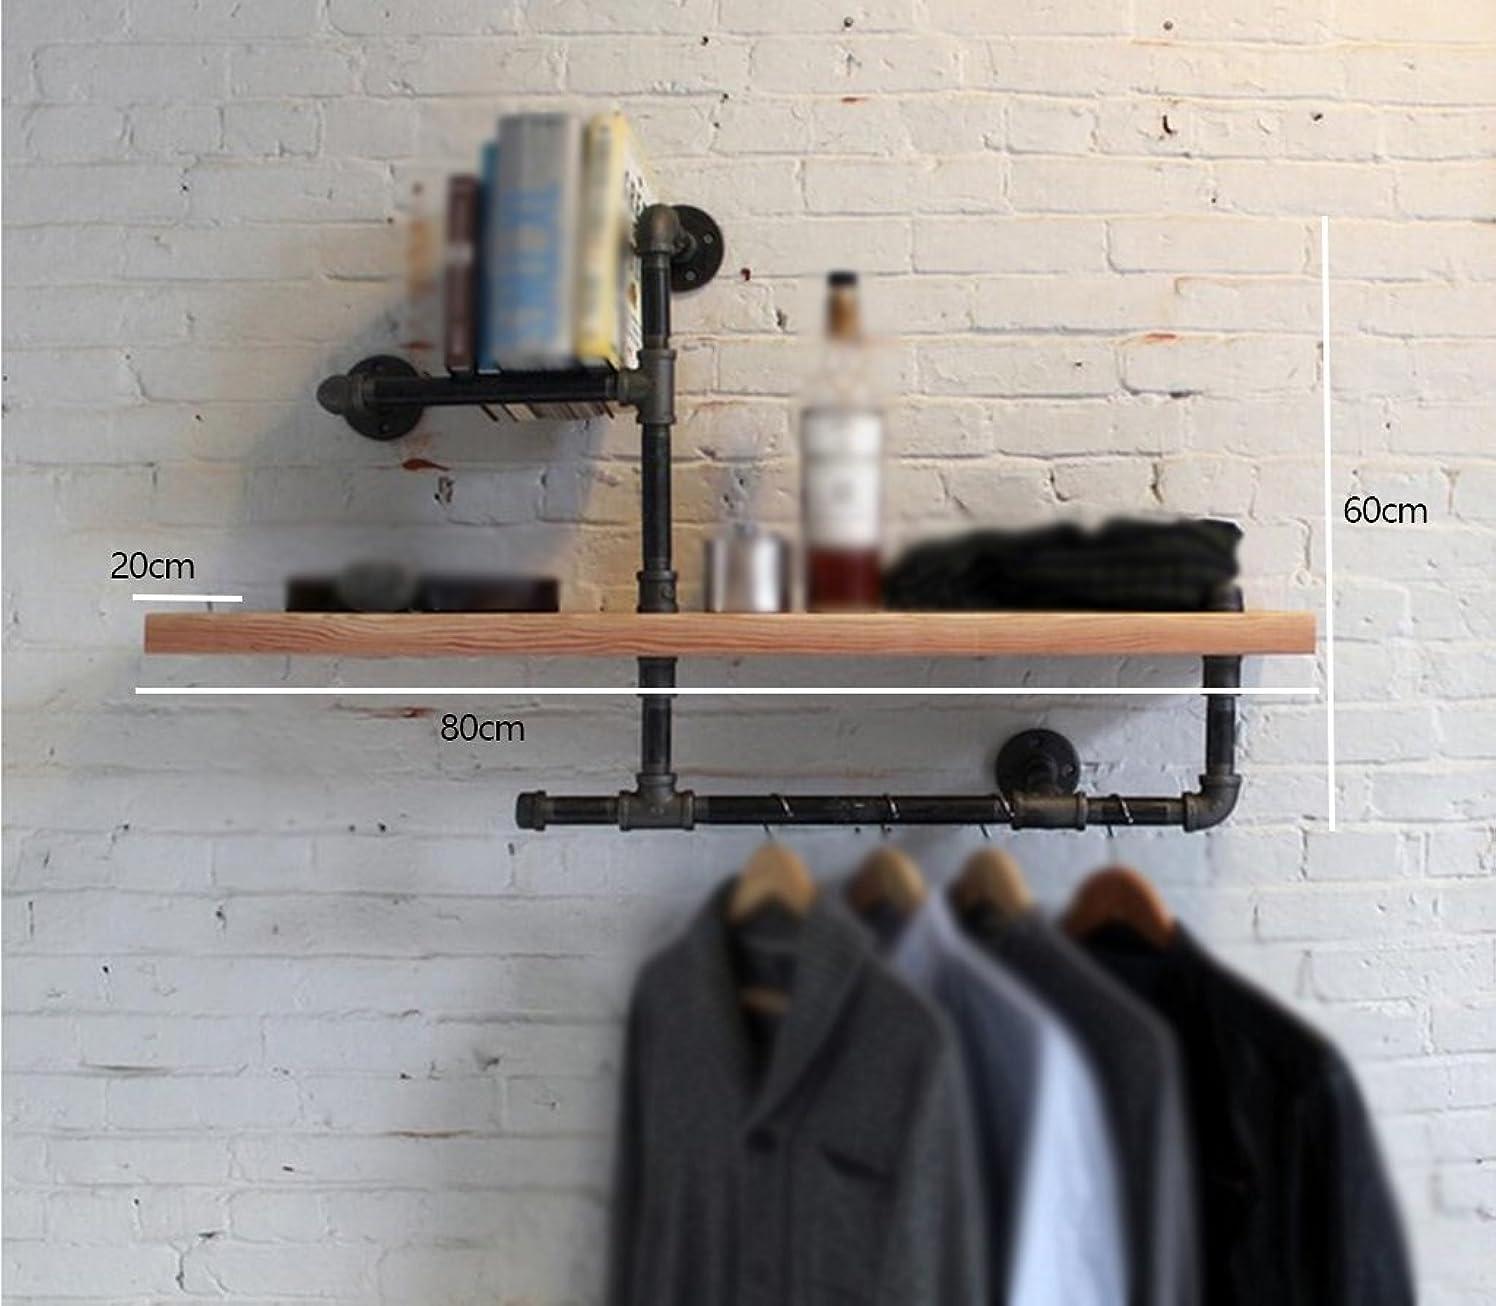 PLLP Wall Decoration, Wall Storage Shelf,Retro Style Bookshelf Iron Display Stand Industrial Pipe Wall Hanging Rack,Household Wall Shelf